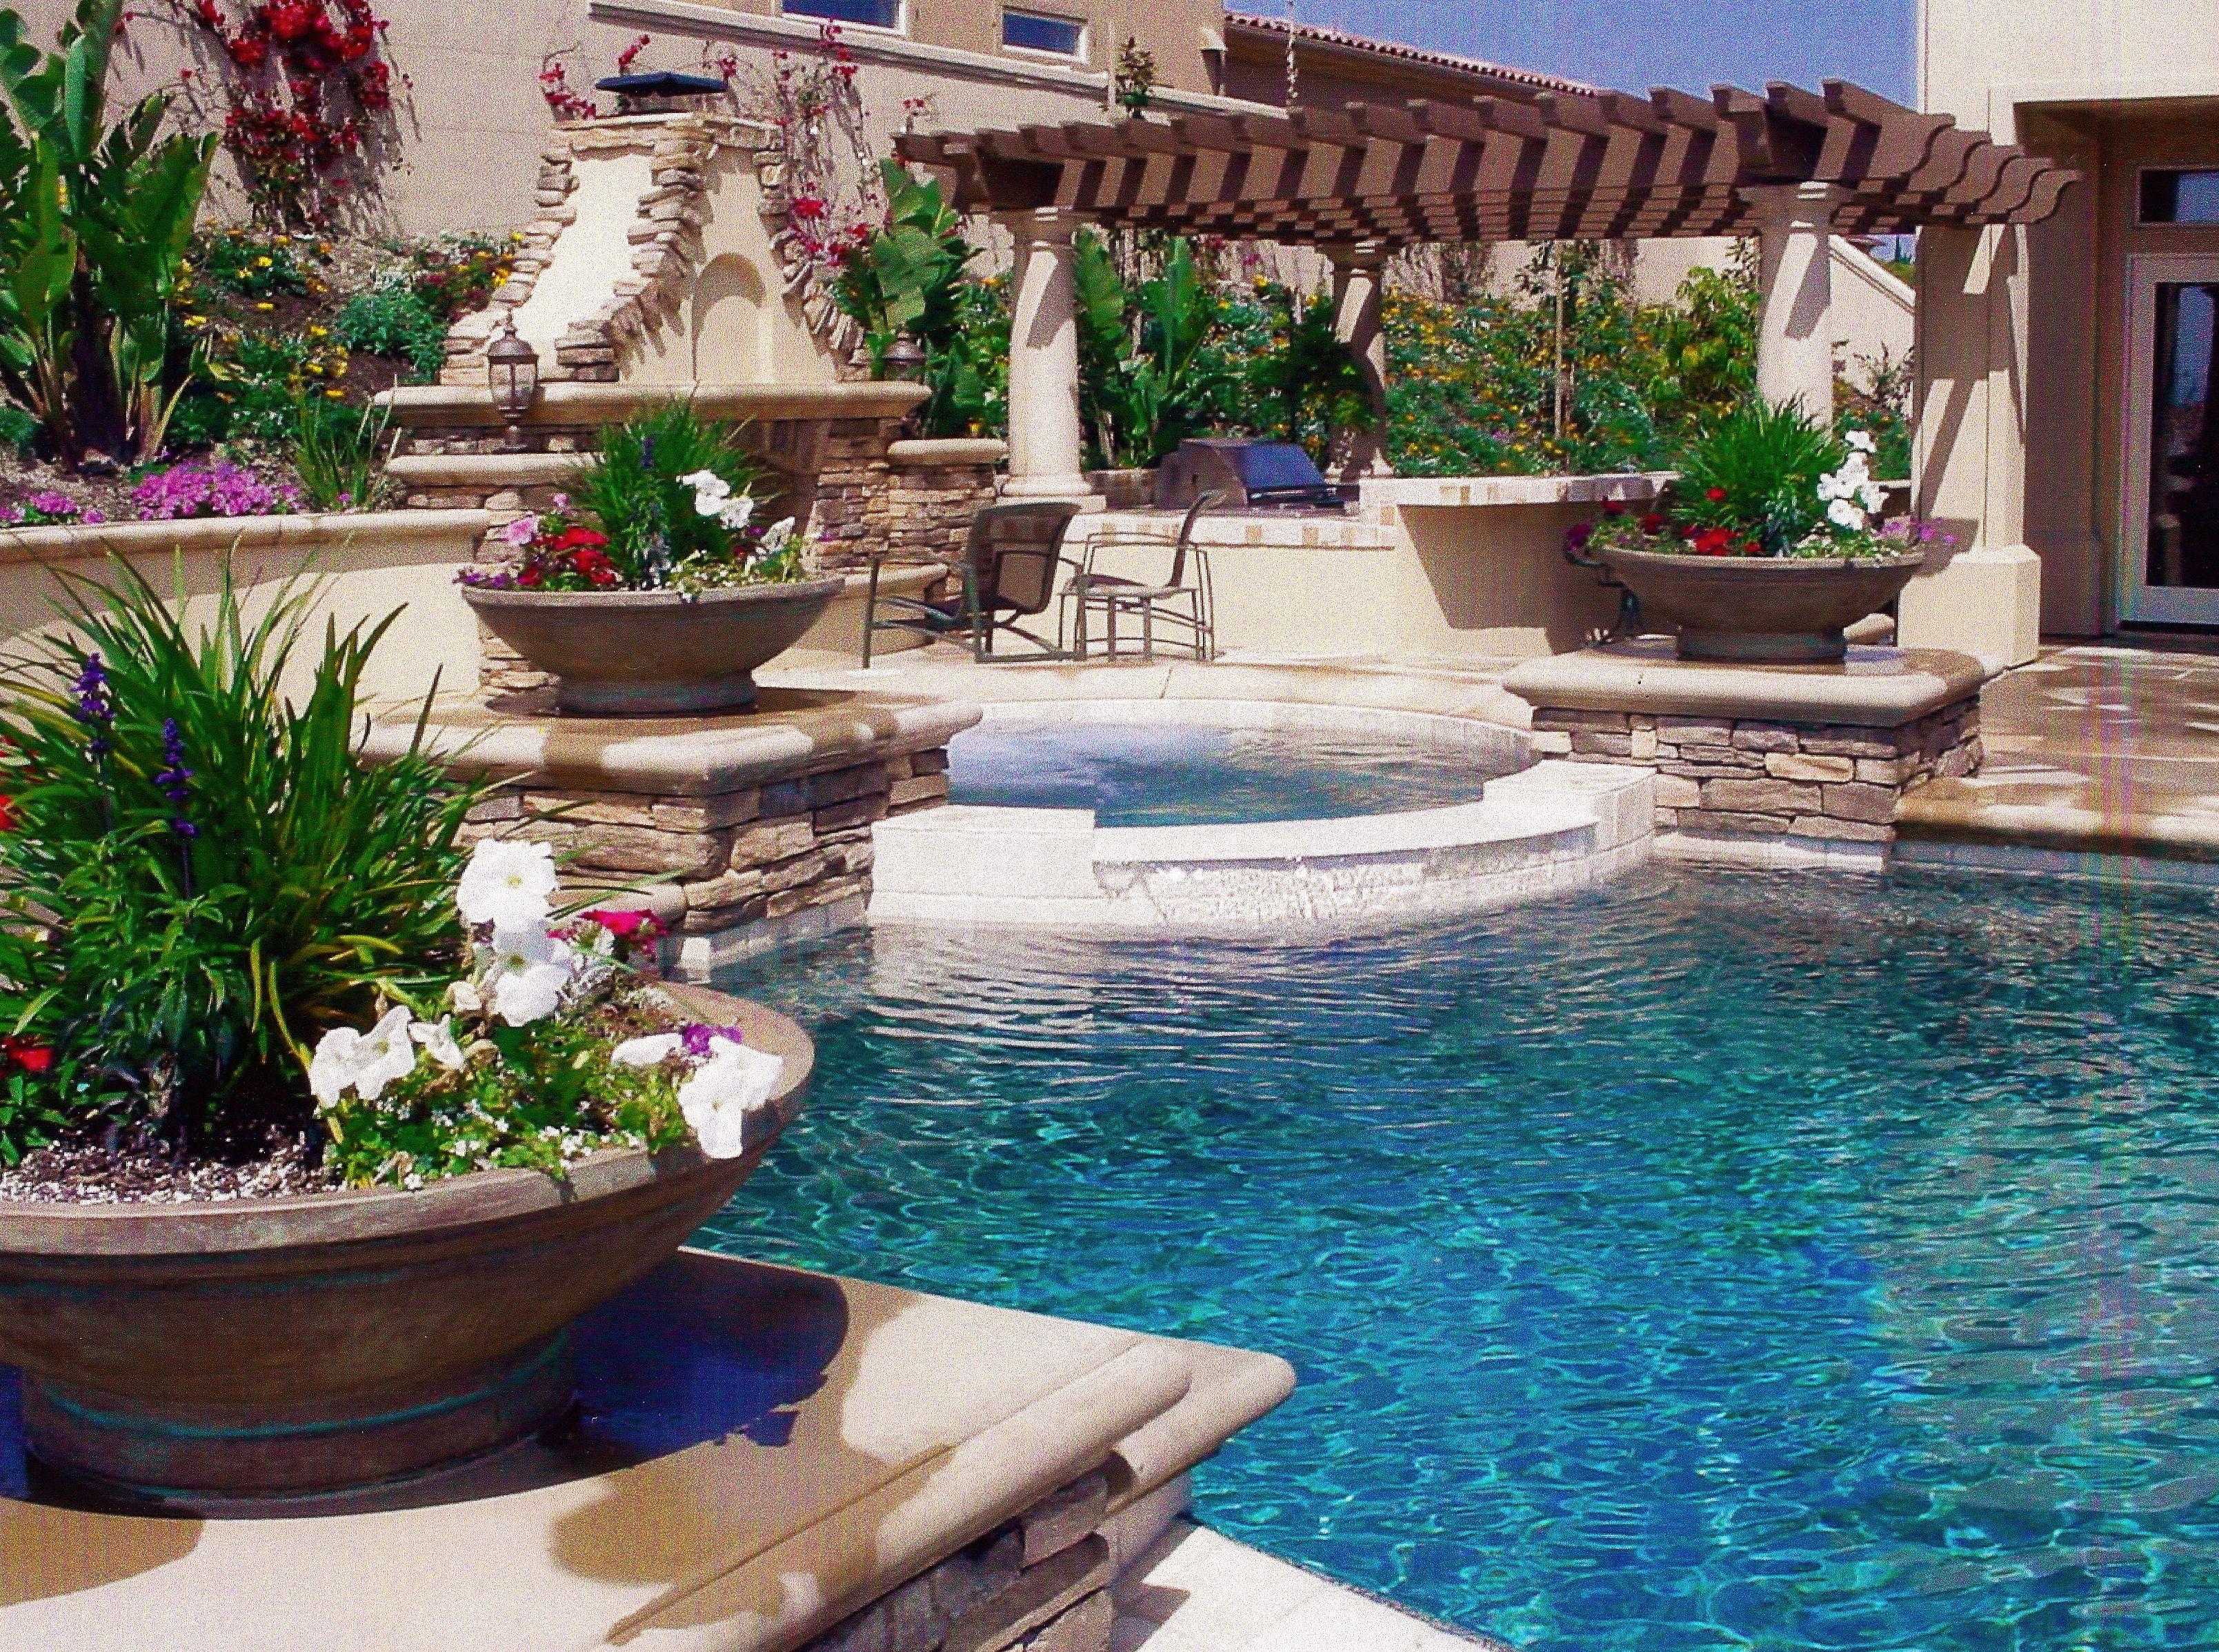 California Patio Living Www Skylarshomeandpatio Com Patio Backyard Outdoor Spaces